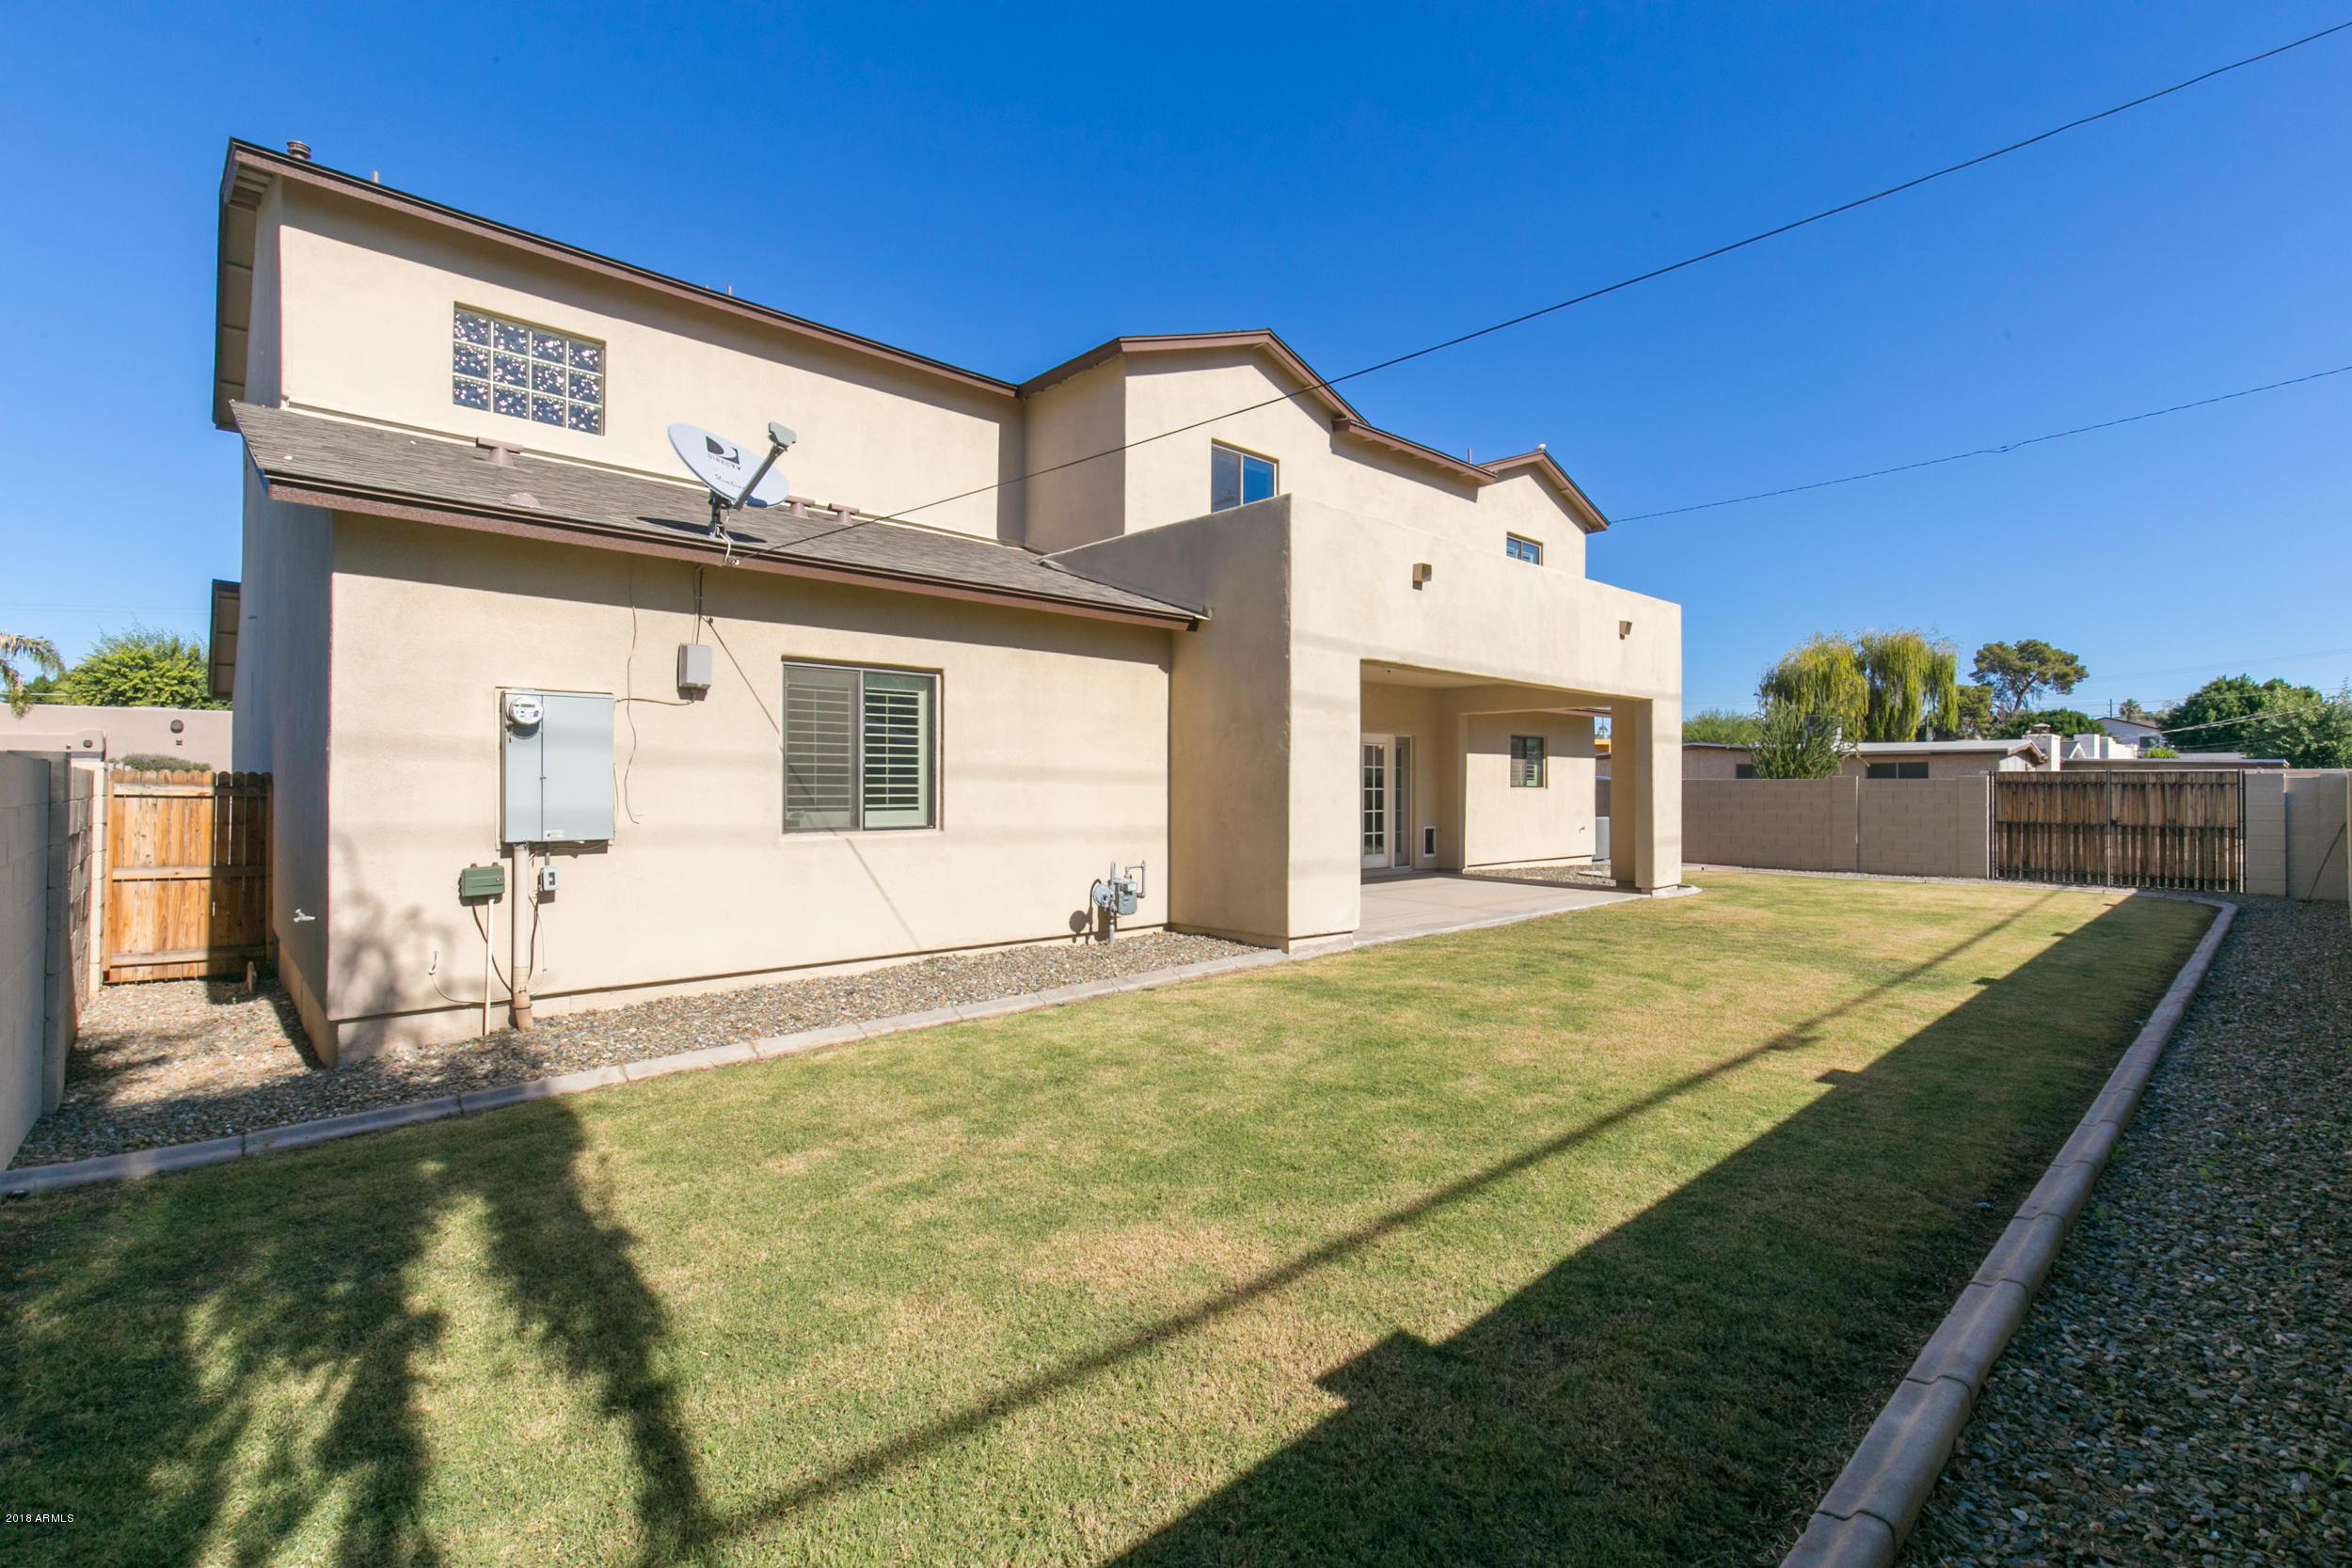 4613 E DEVONSHIRE Avenue, Phoenix, AZ 85018 (MLS# 5847530